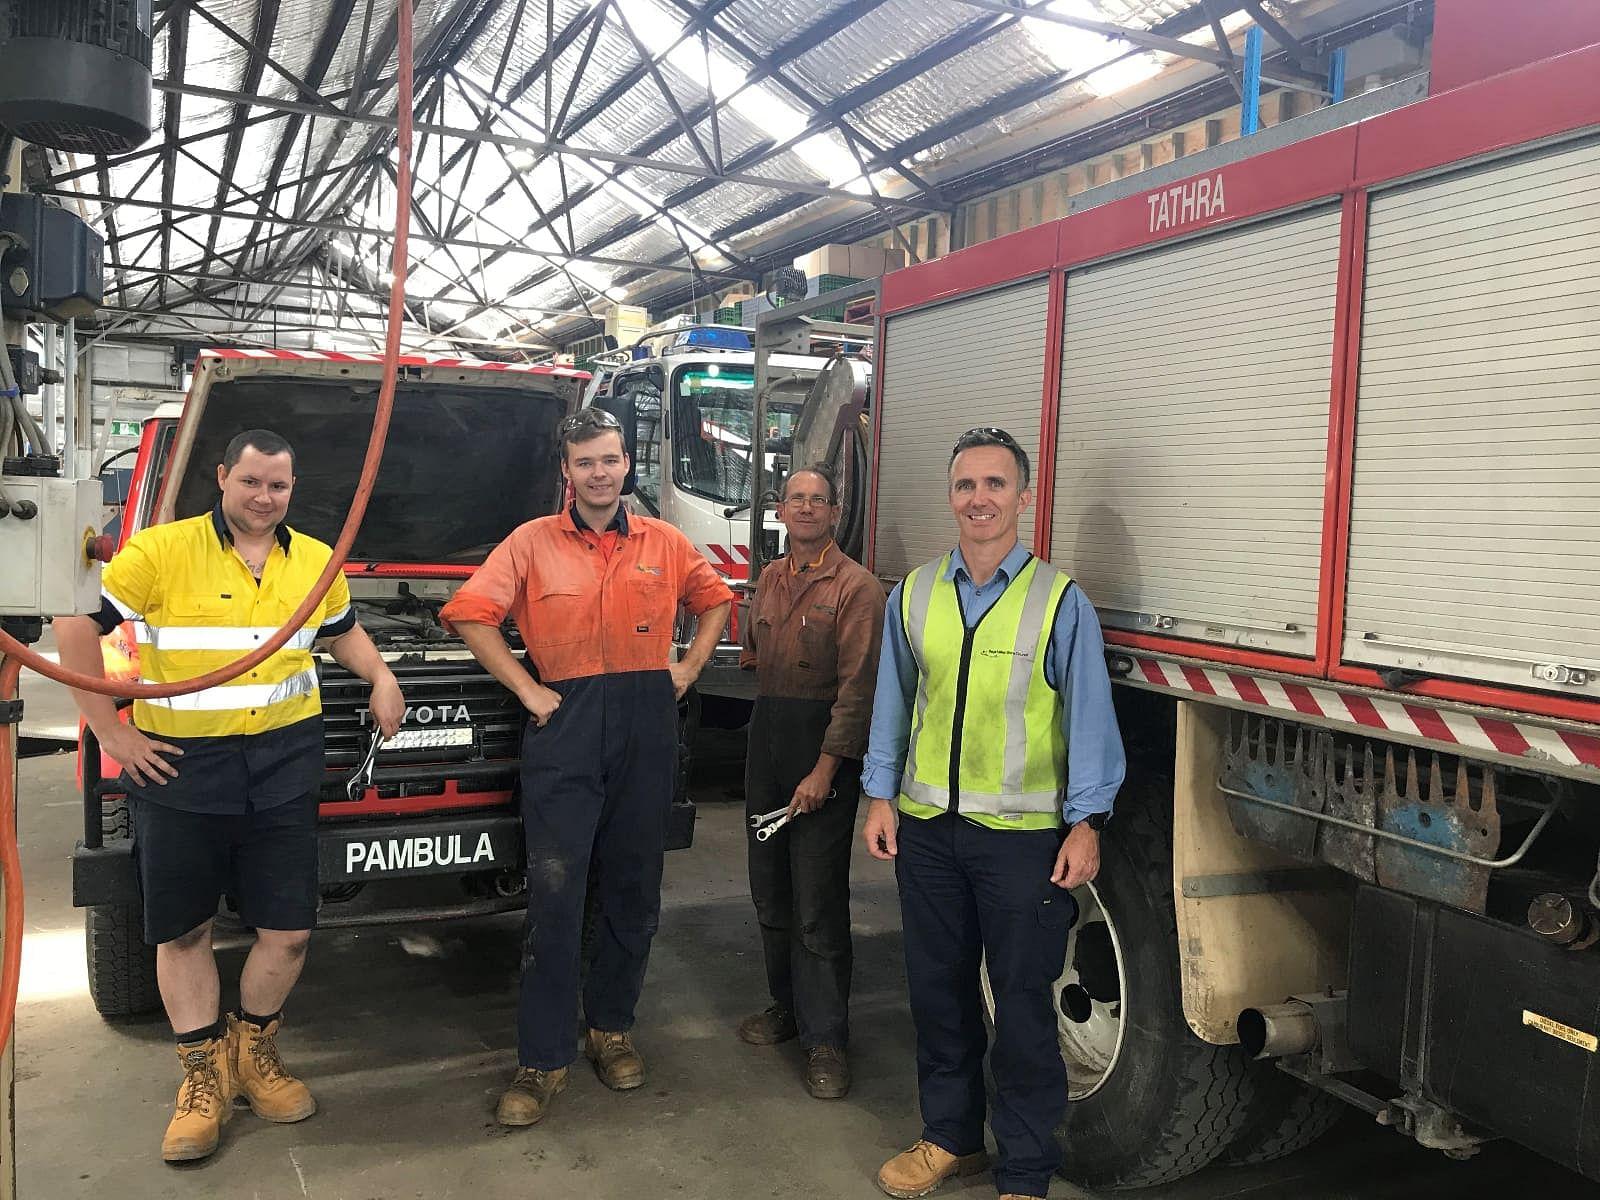 L to R Adam Swarbrick (Mechanic), Zane Bagley (Apprentice), Bruce Summerell (Mechanic) and Sean Baggett (Fleet Supervisor)